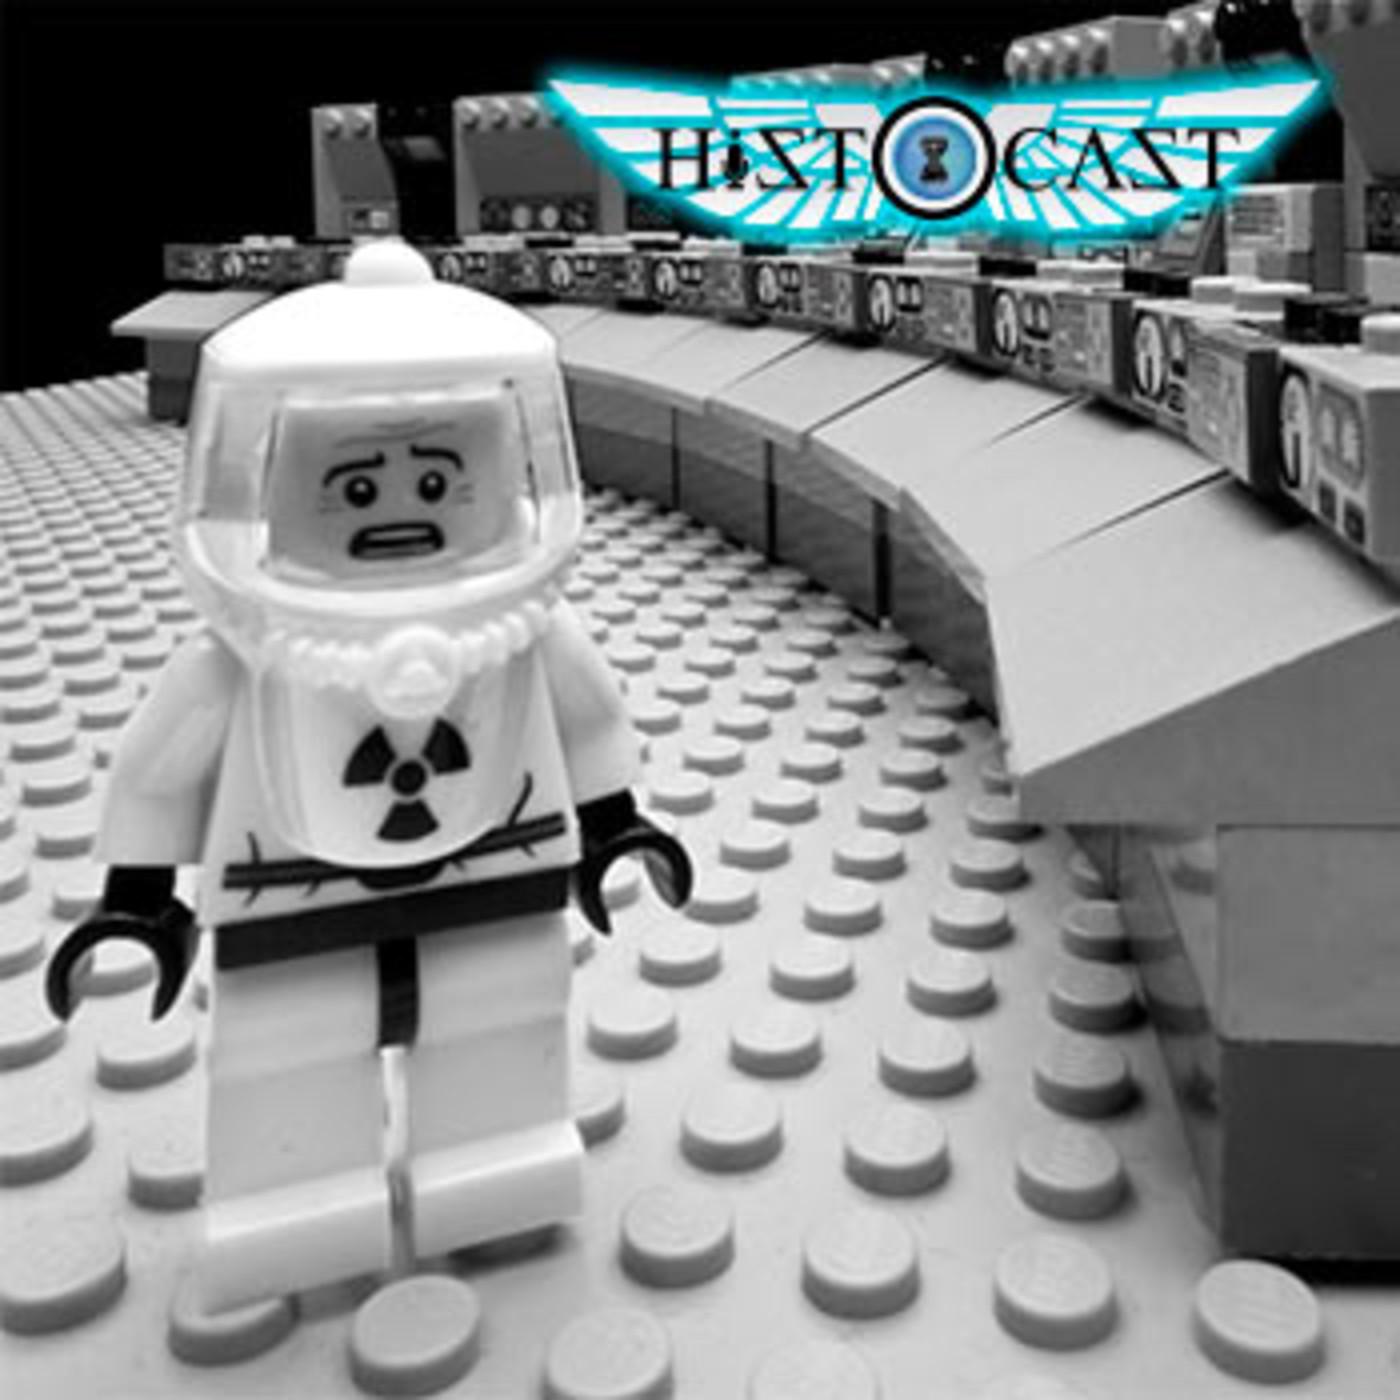 HistoCast 122 - Cagadas nucleares